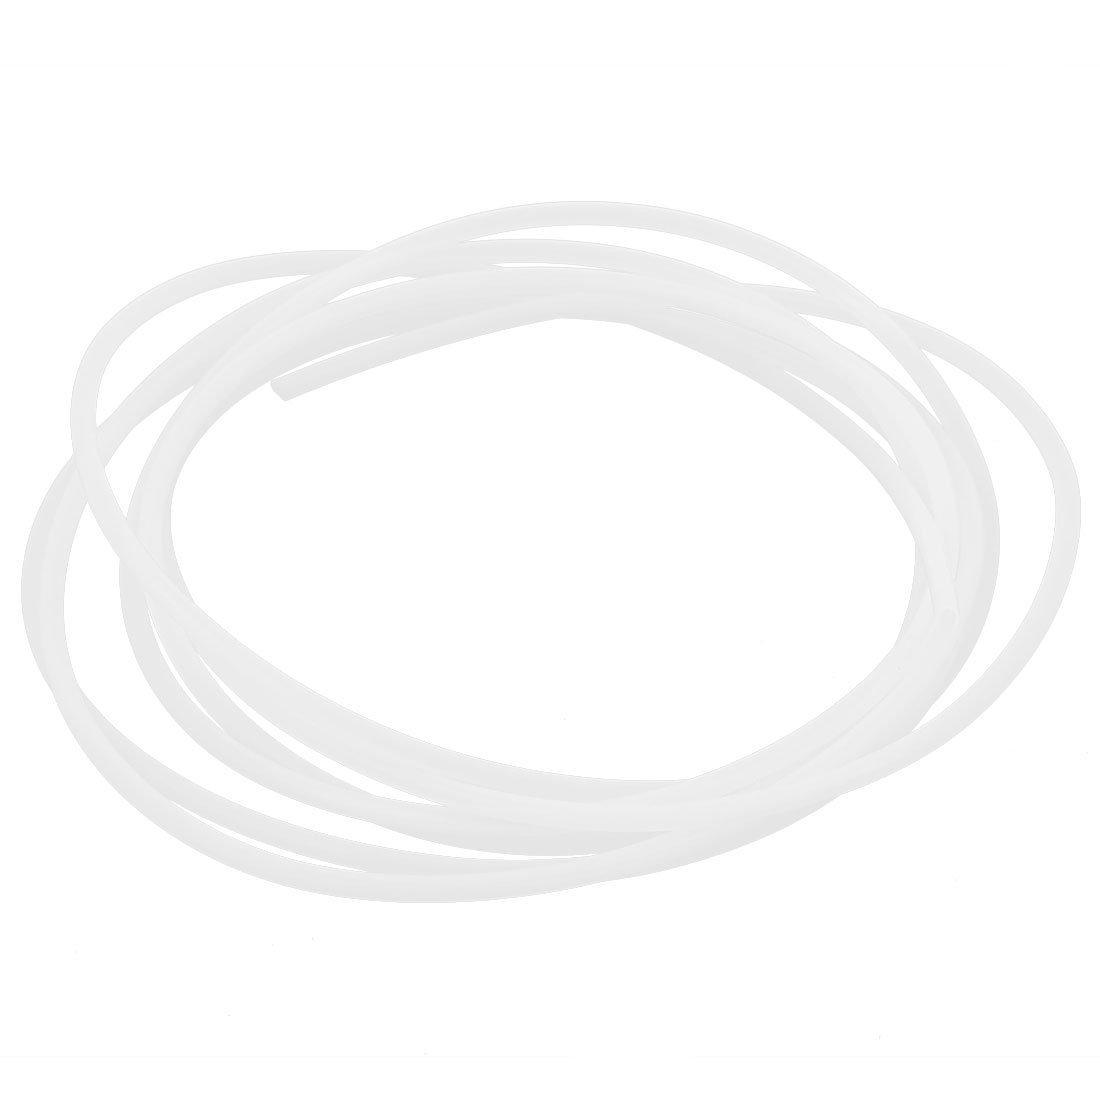 SODIAL(R) 1M Laenge 2mm ID 3mm OD PTFE Rohr Schlauch Leitung fuer 3D Druck RepRap weiss